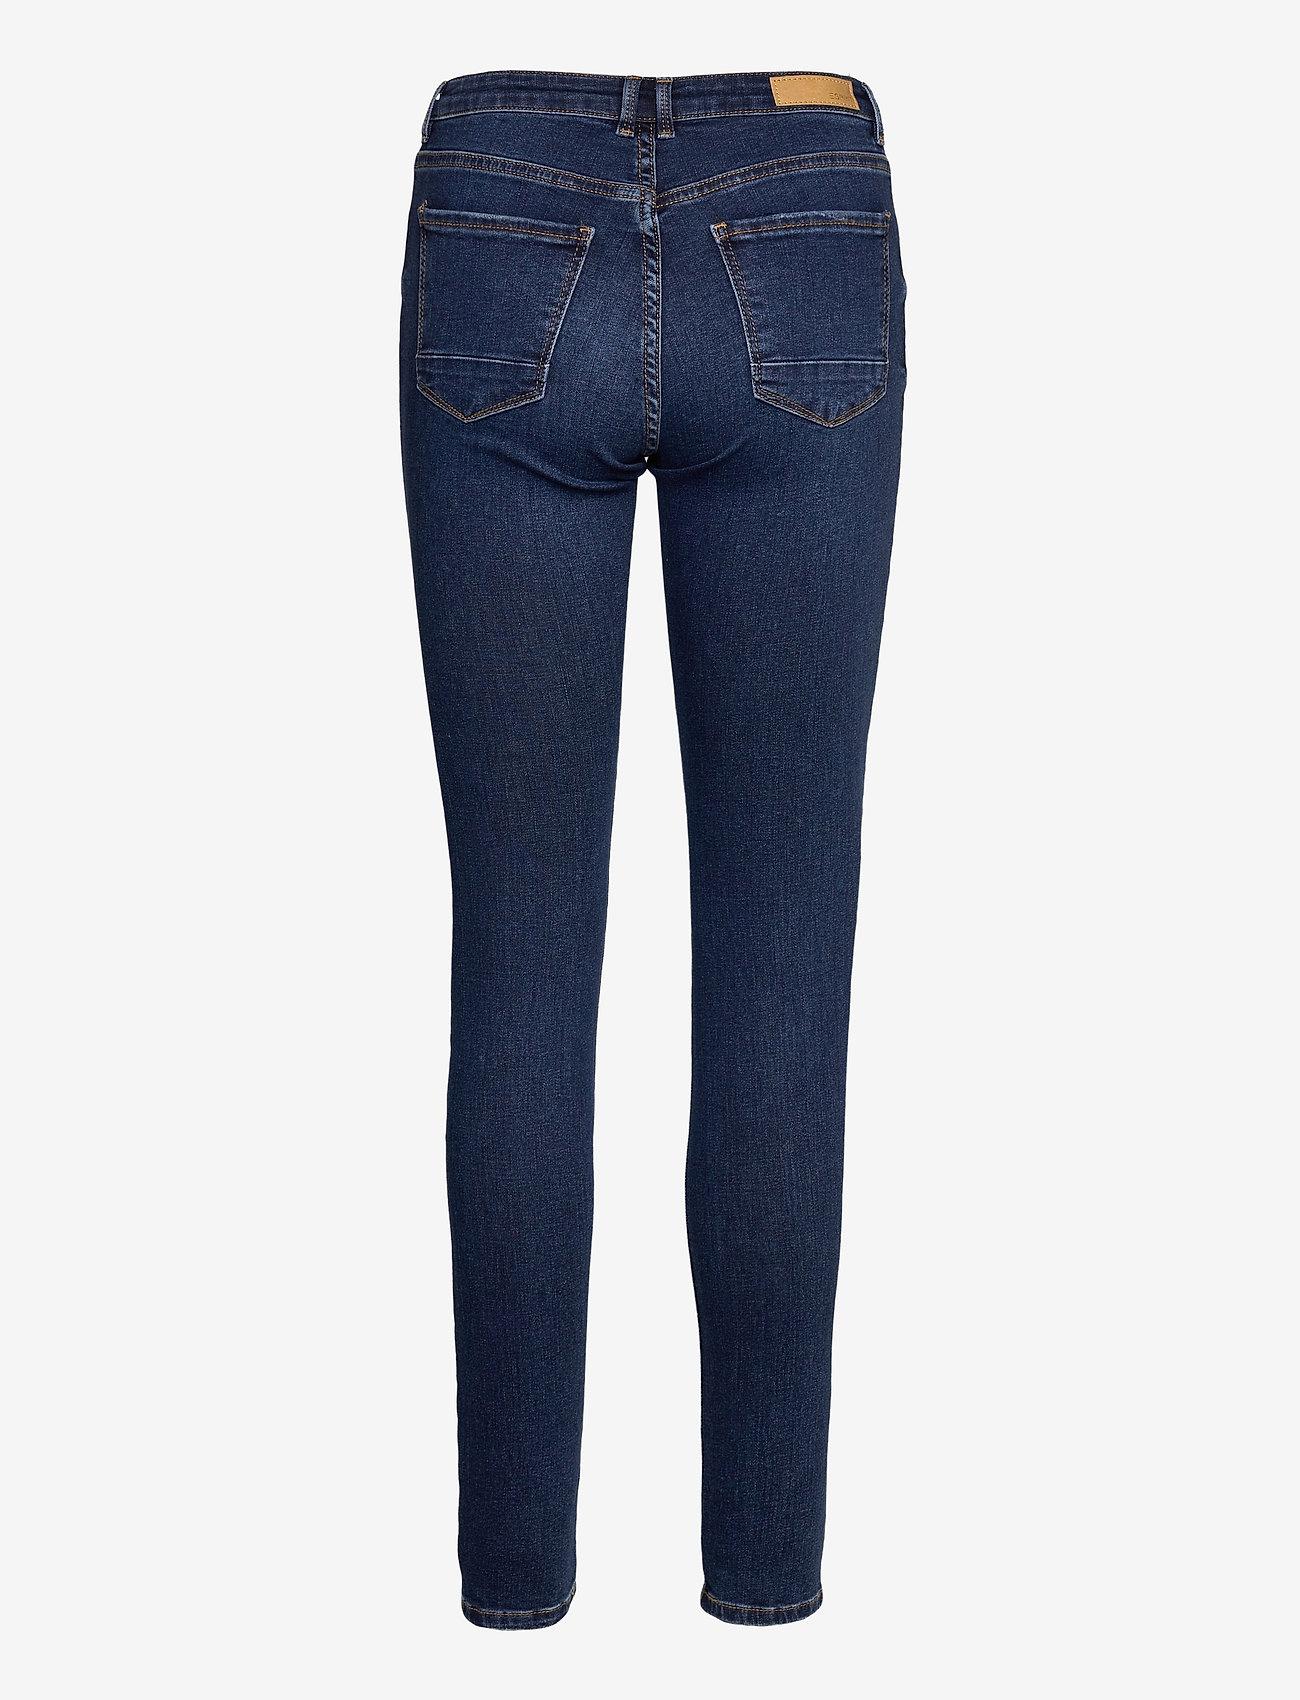 Esprit Casual - Pants denim - skinny jeans - blue medium wash - 1